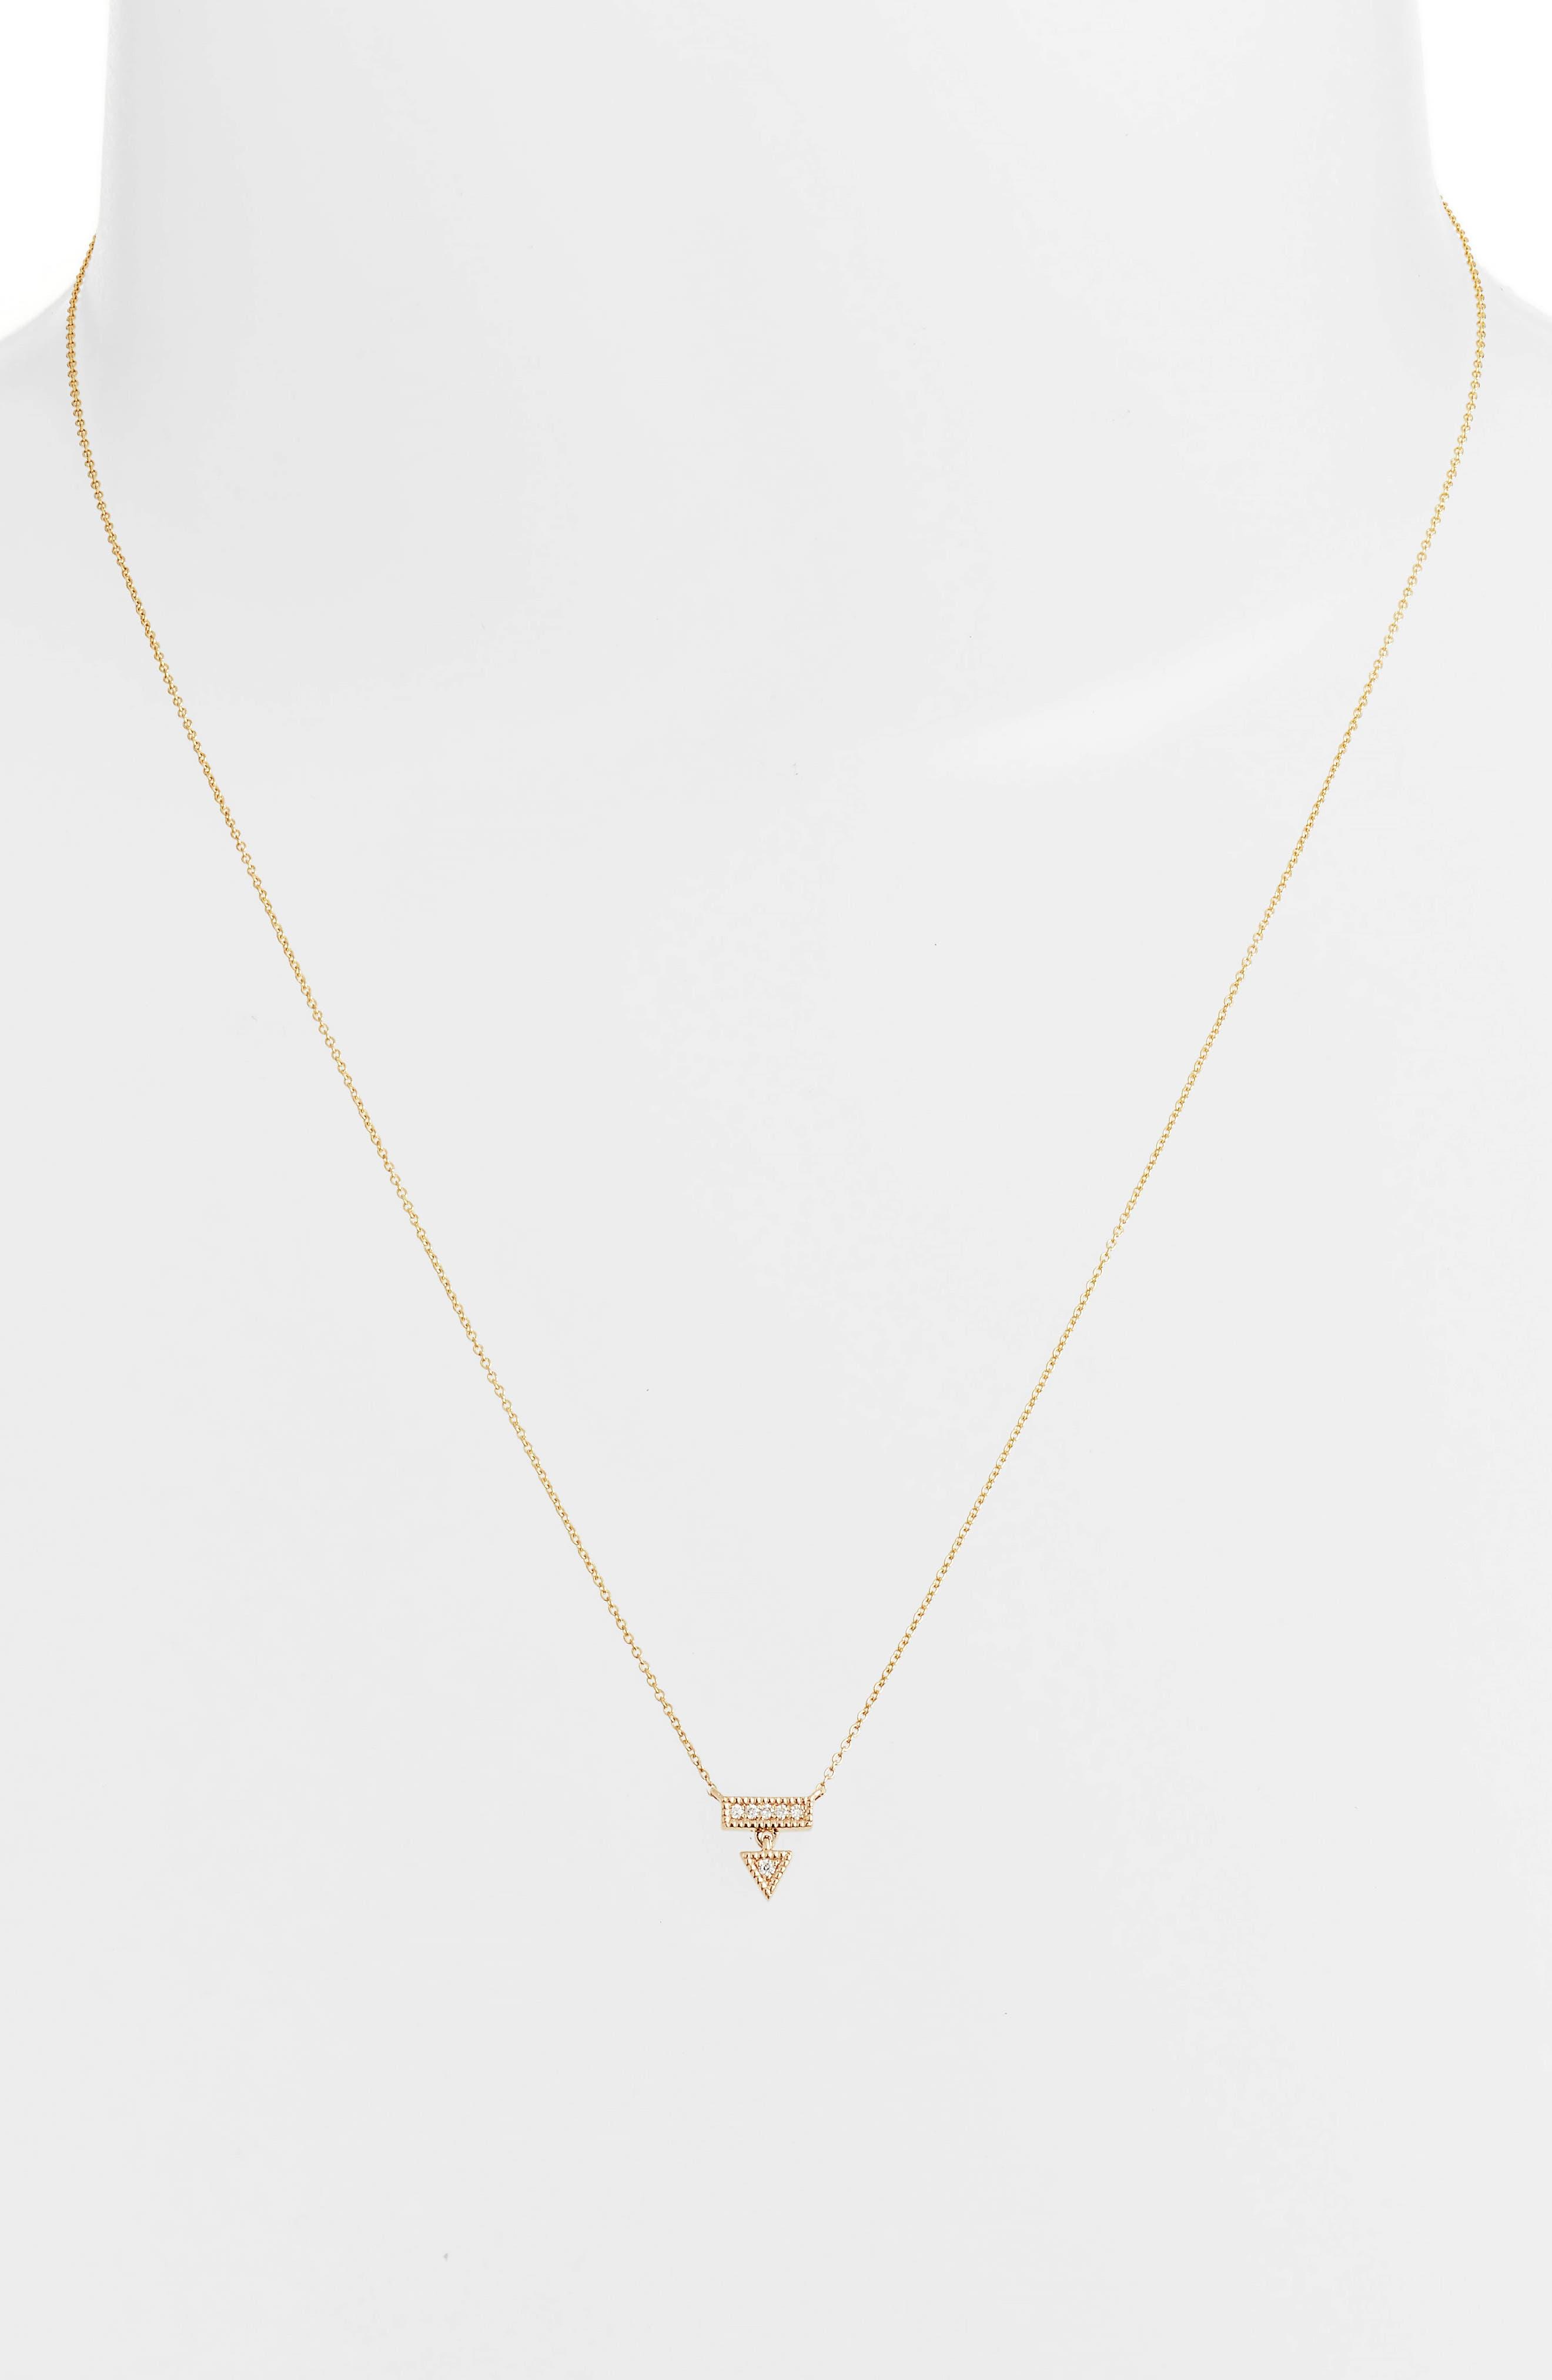 Emily Sarah Diamond Triangle Dangle Necklace,                             Alternate thumbnail 2, color,                             YELLOW GOLD